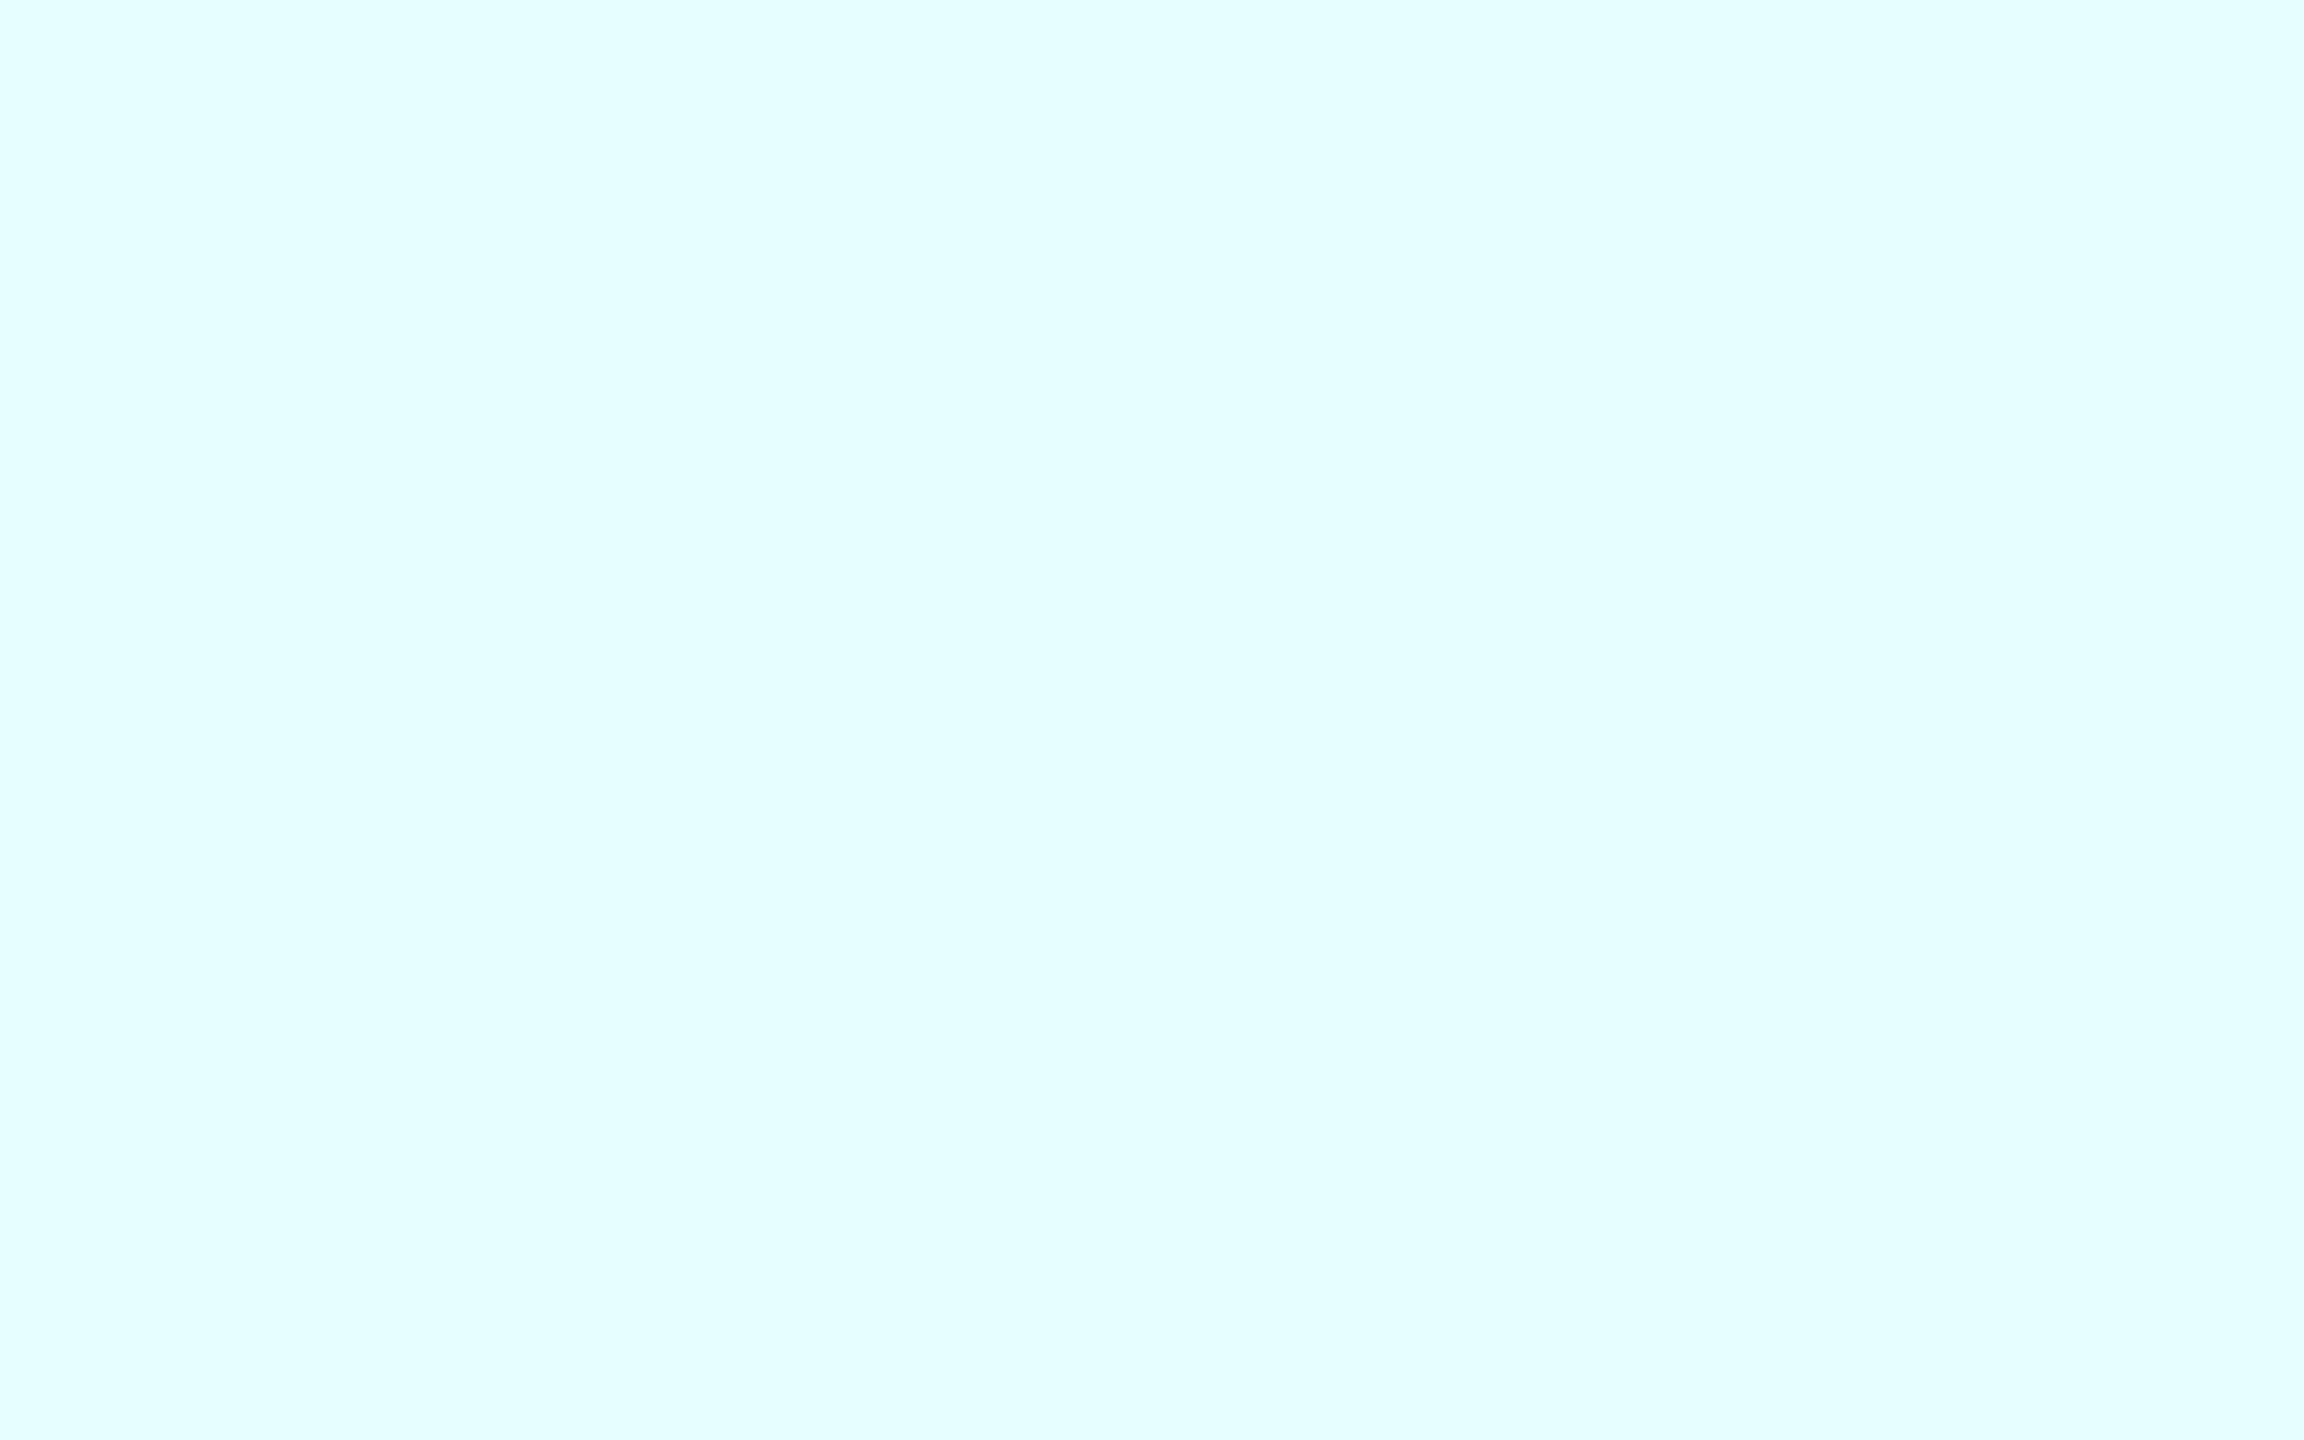 2304x1440 Bubbles Solid Color Background